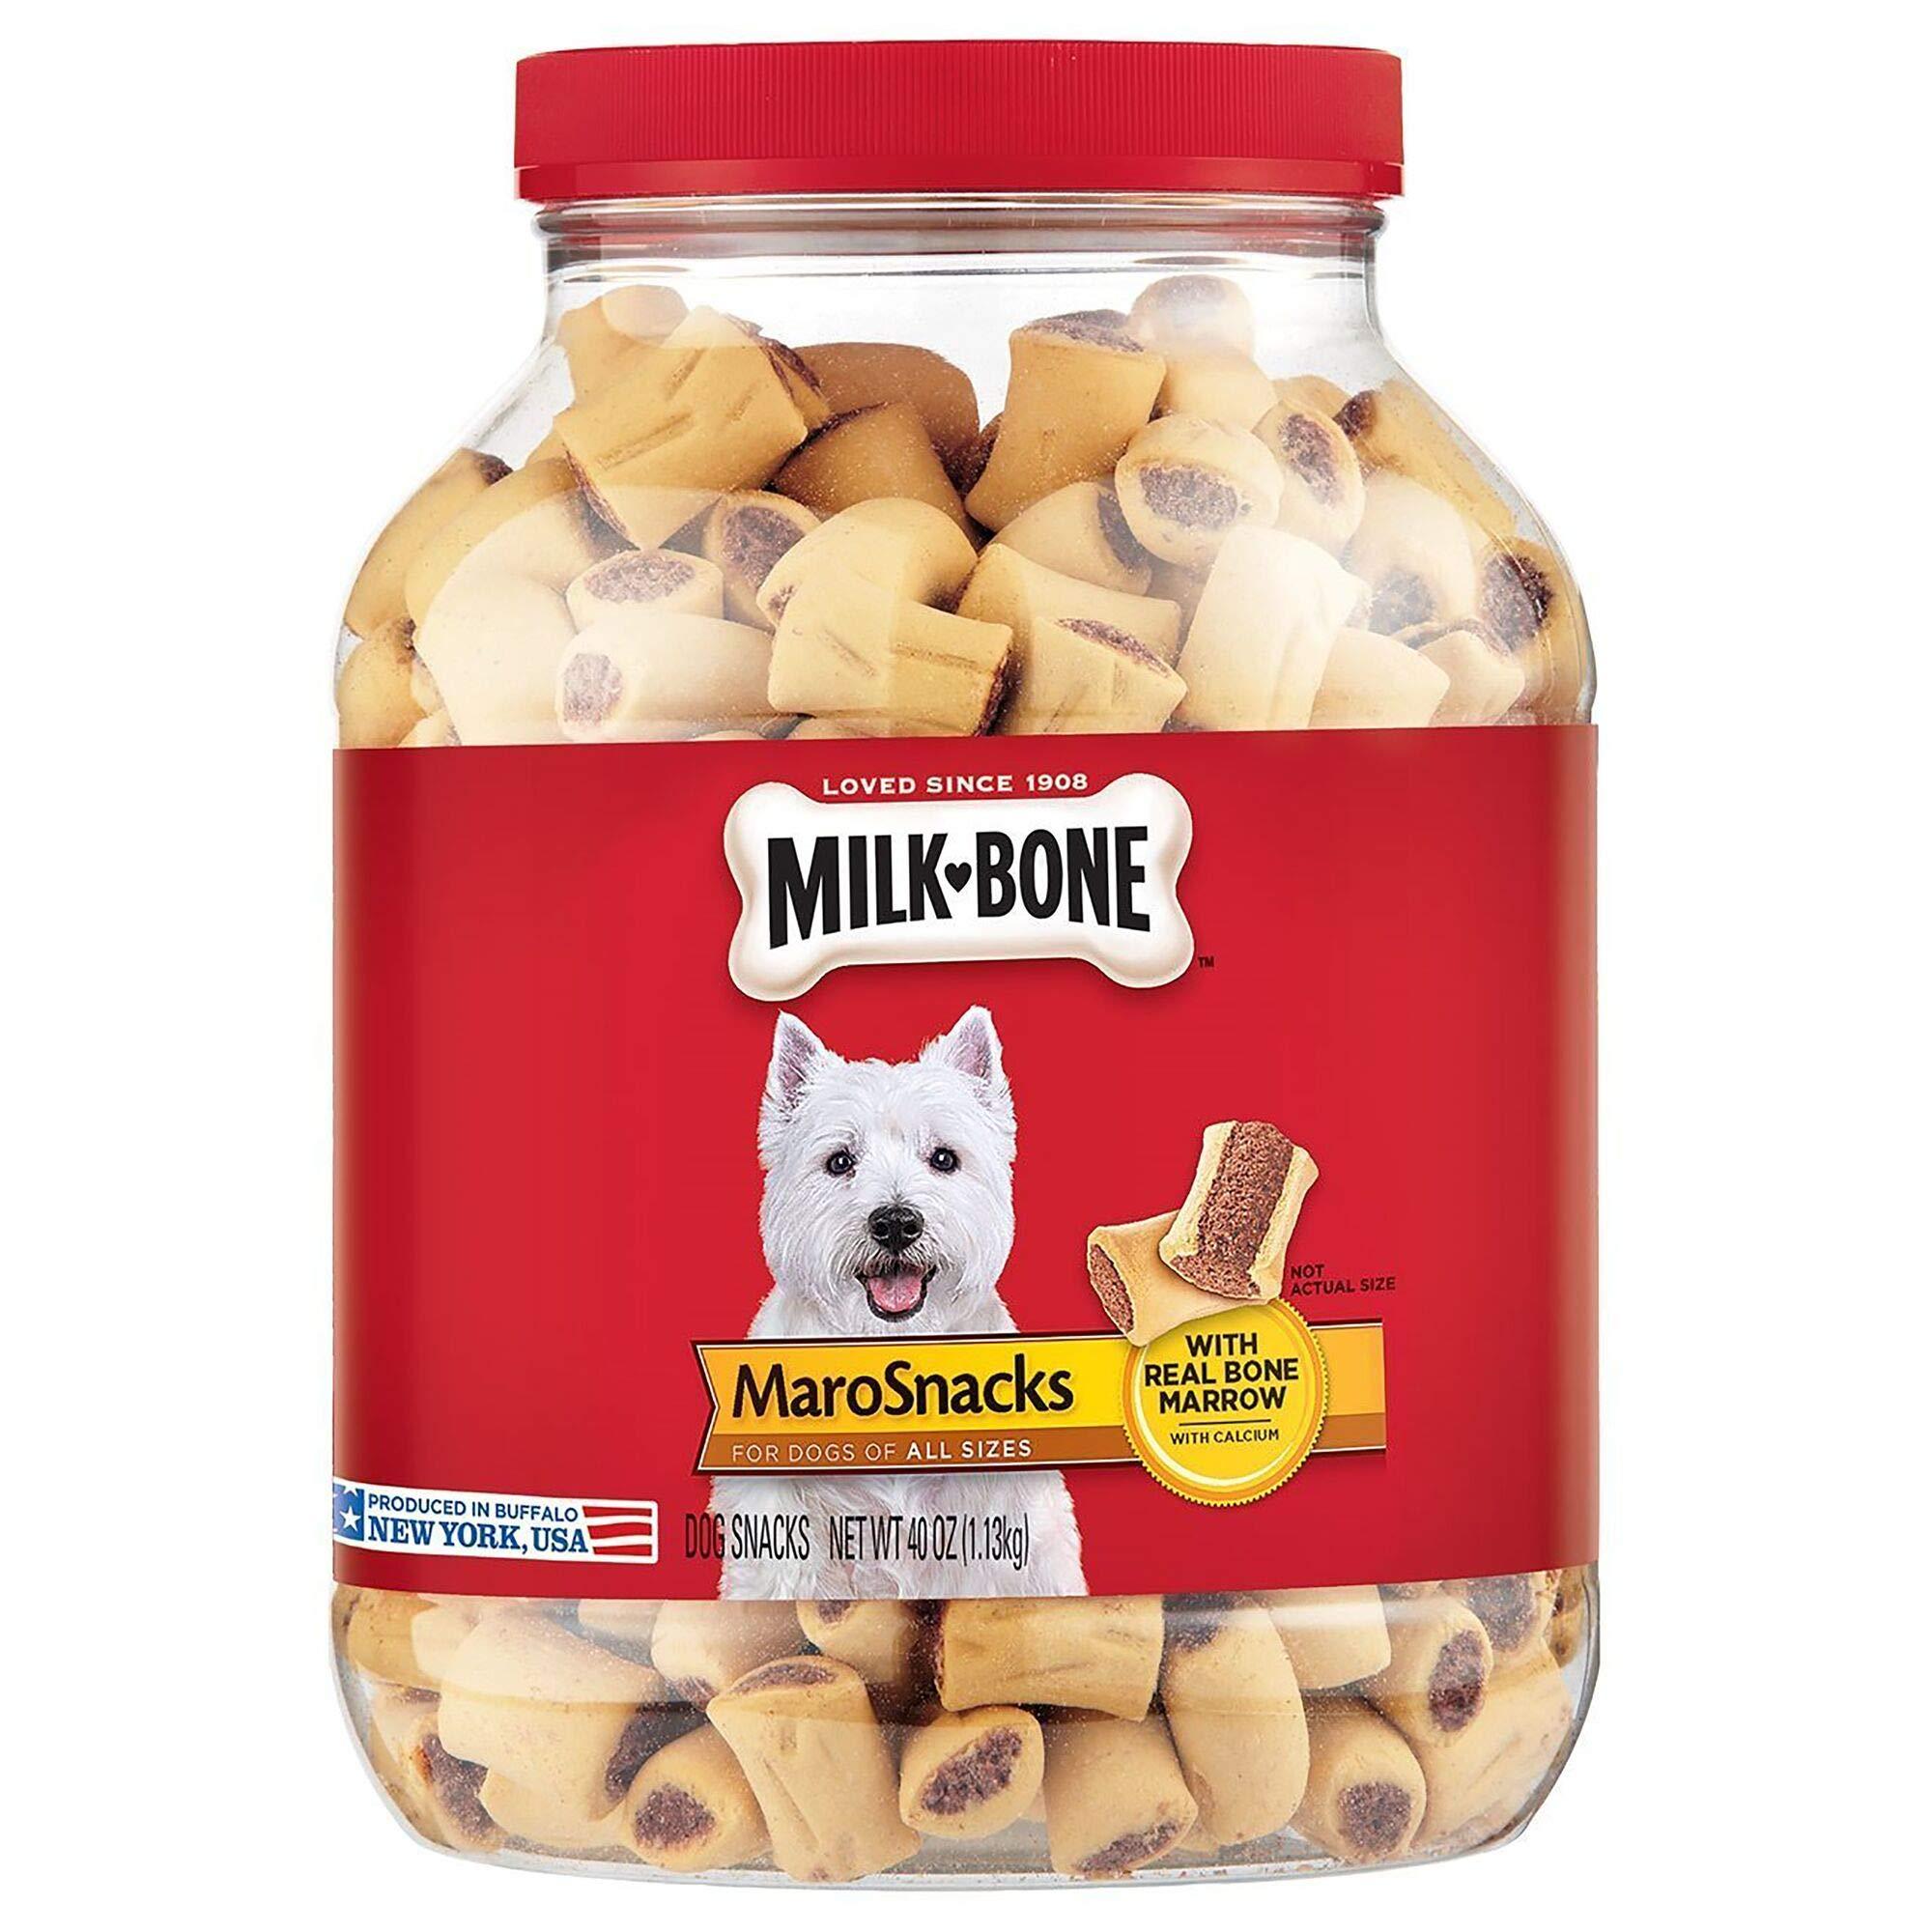 Milk-Bone MaroSnacks Dog Treats with Real Bone Marrow and Calcium